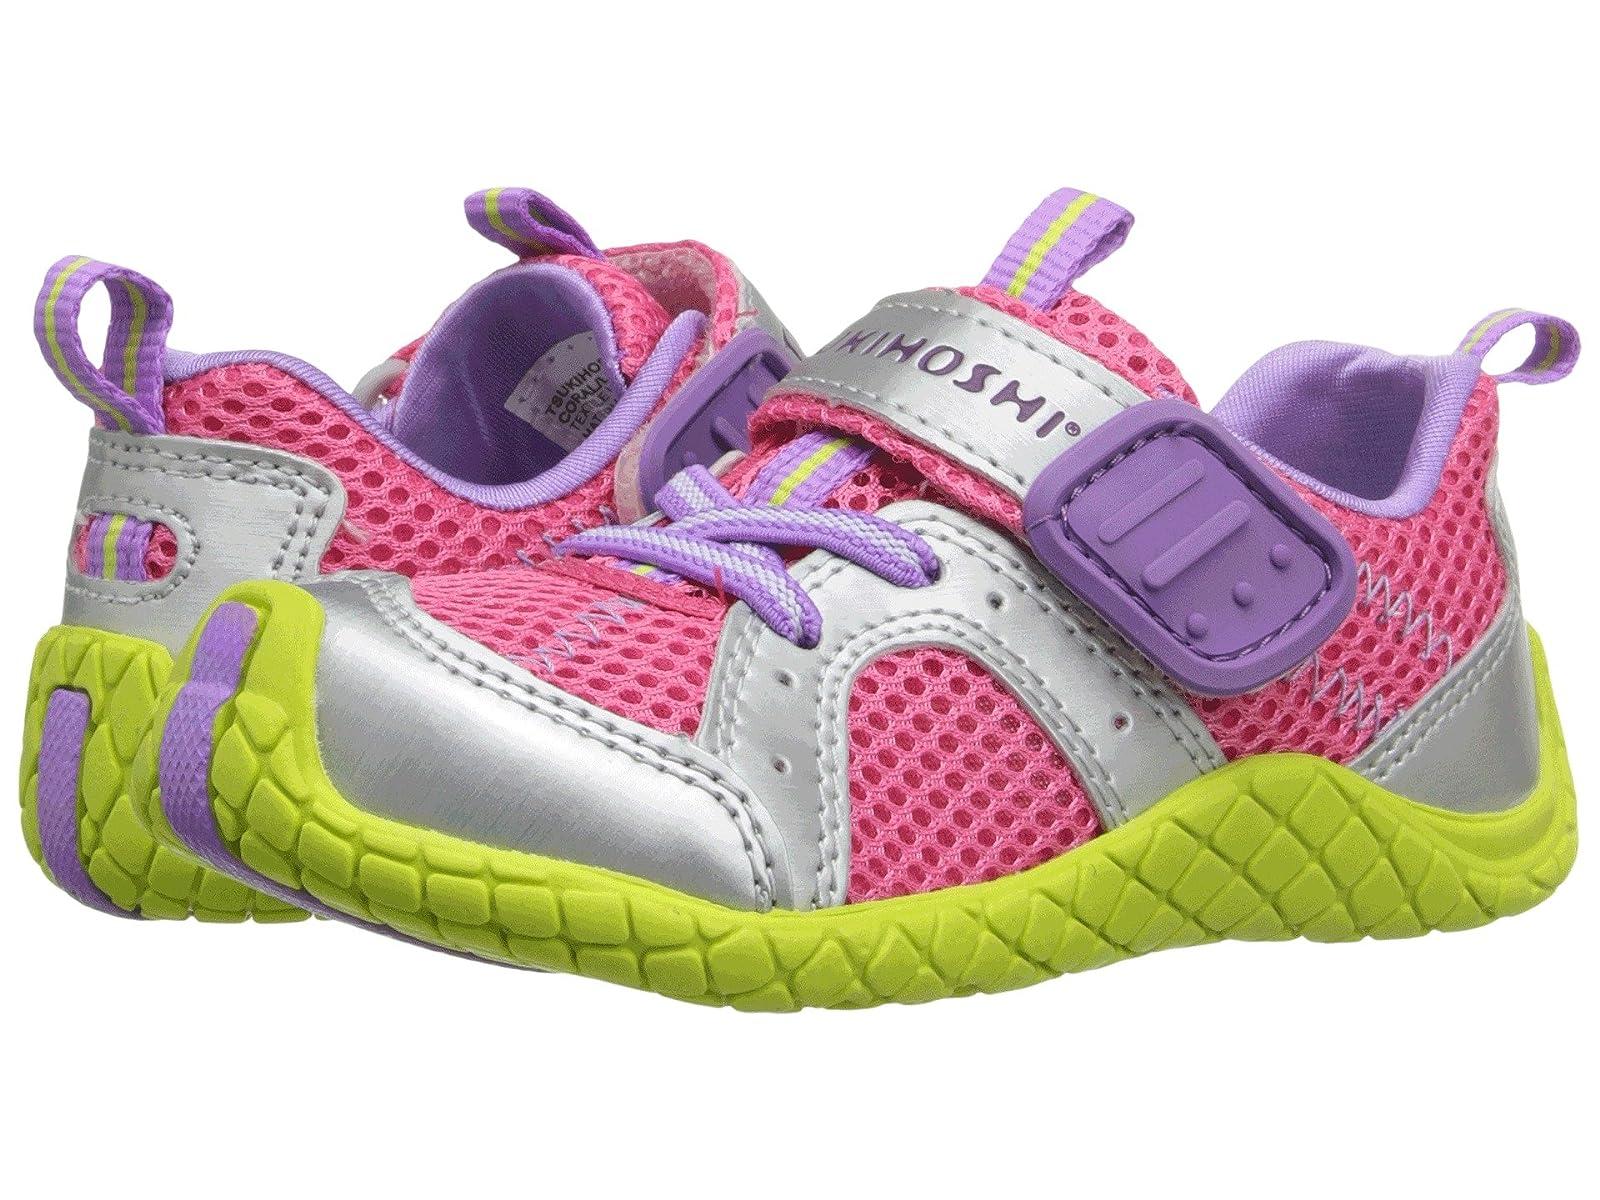 Tsukihoshi Kids Marina (Toddler/Little Kid)Atmospheric grades have affordable shoes